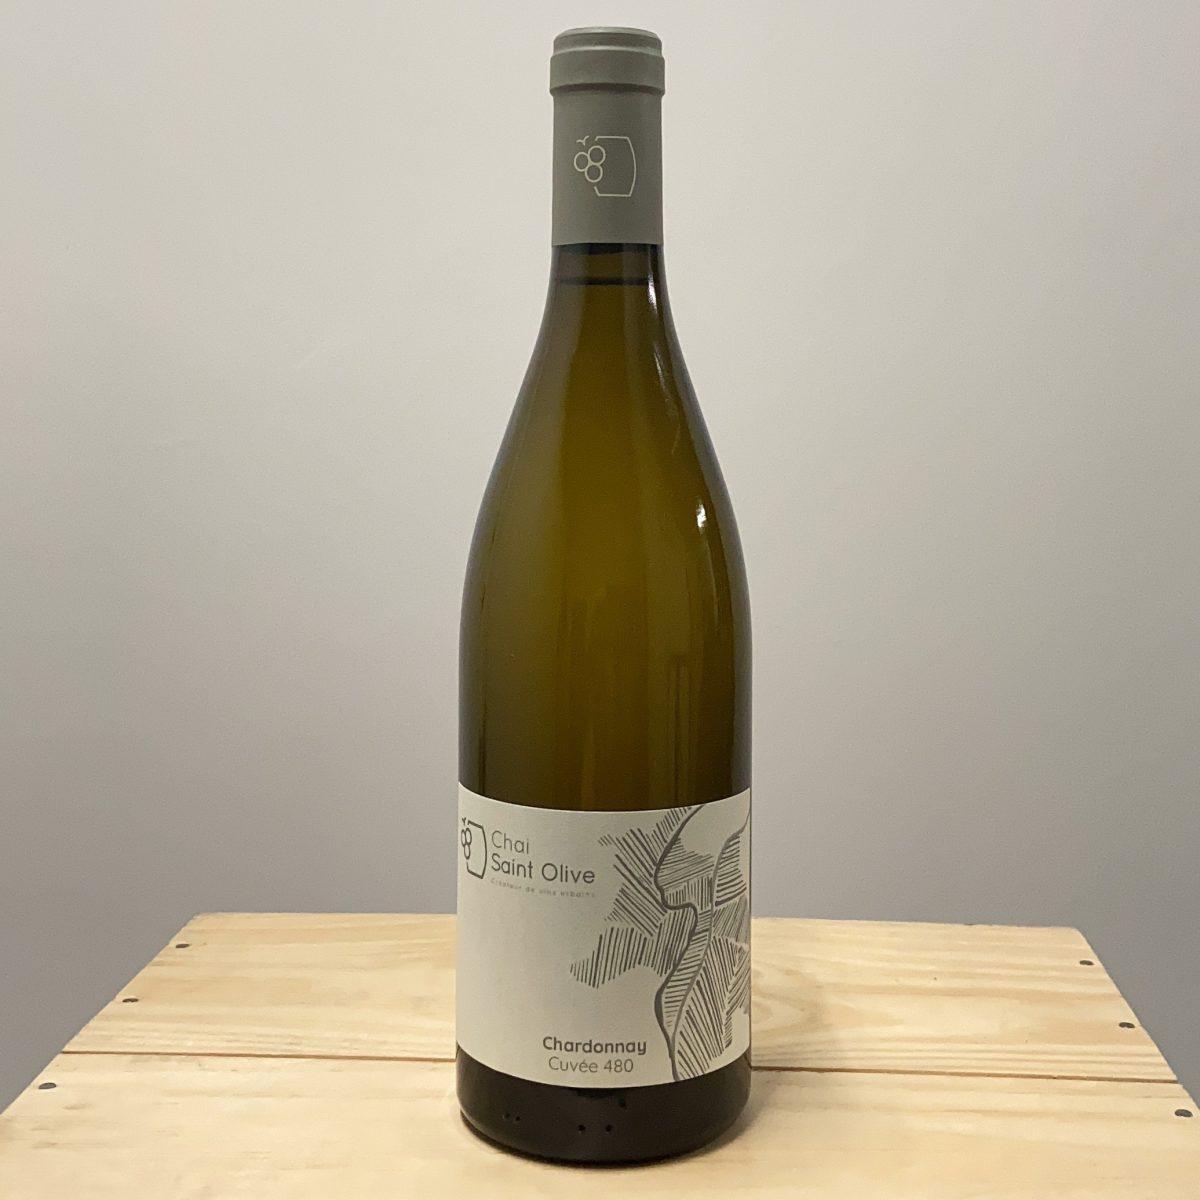 Chai Saint Olive, vins urbains, Chardonnay